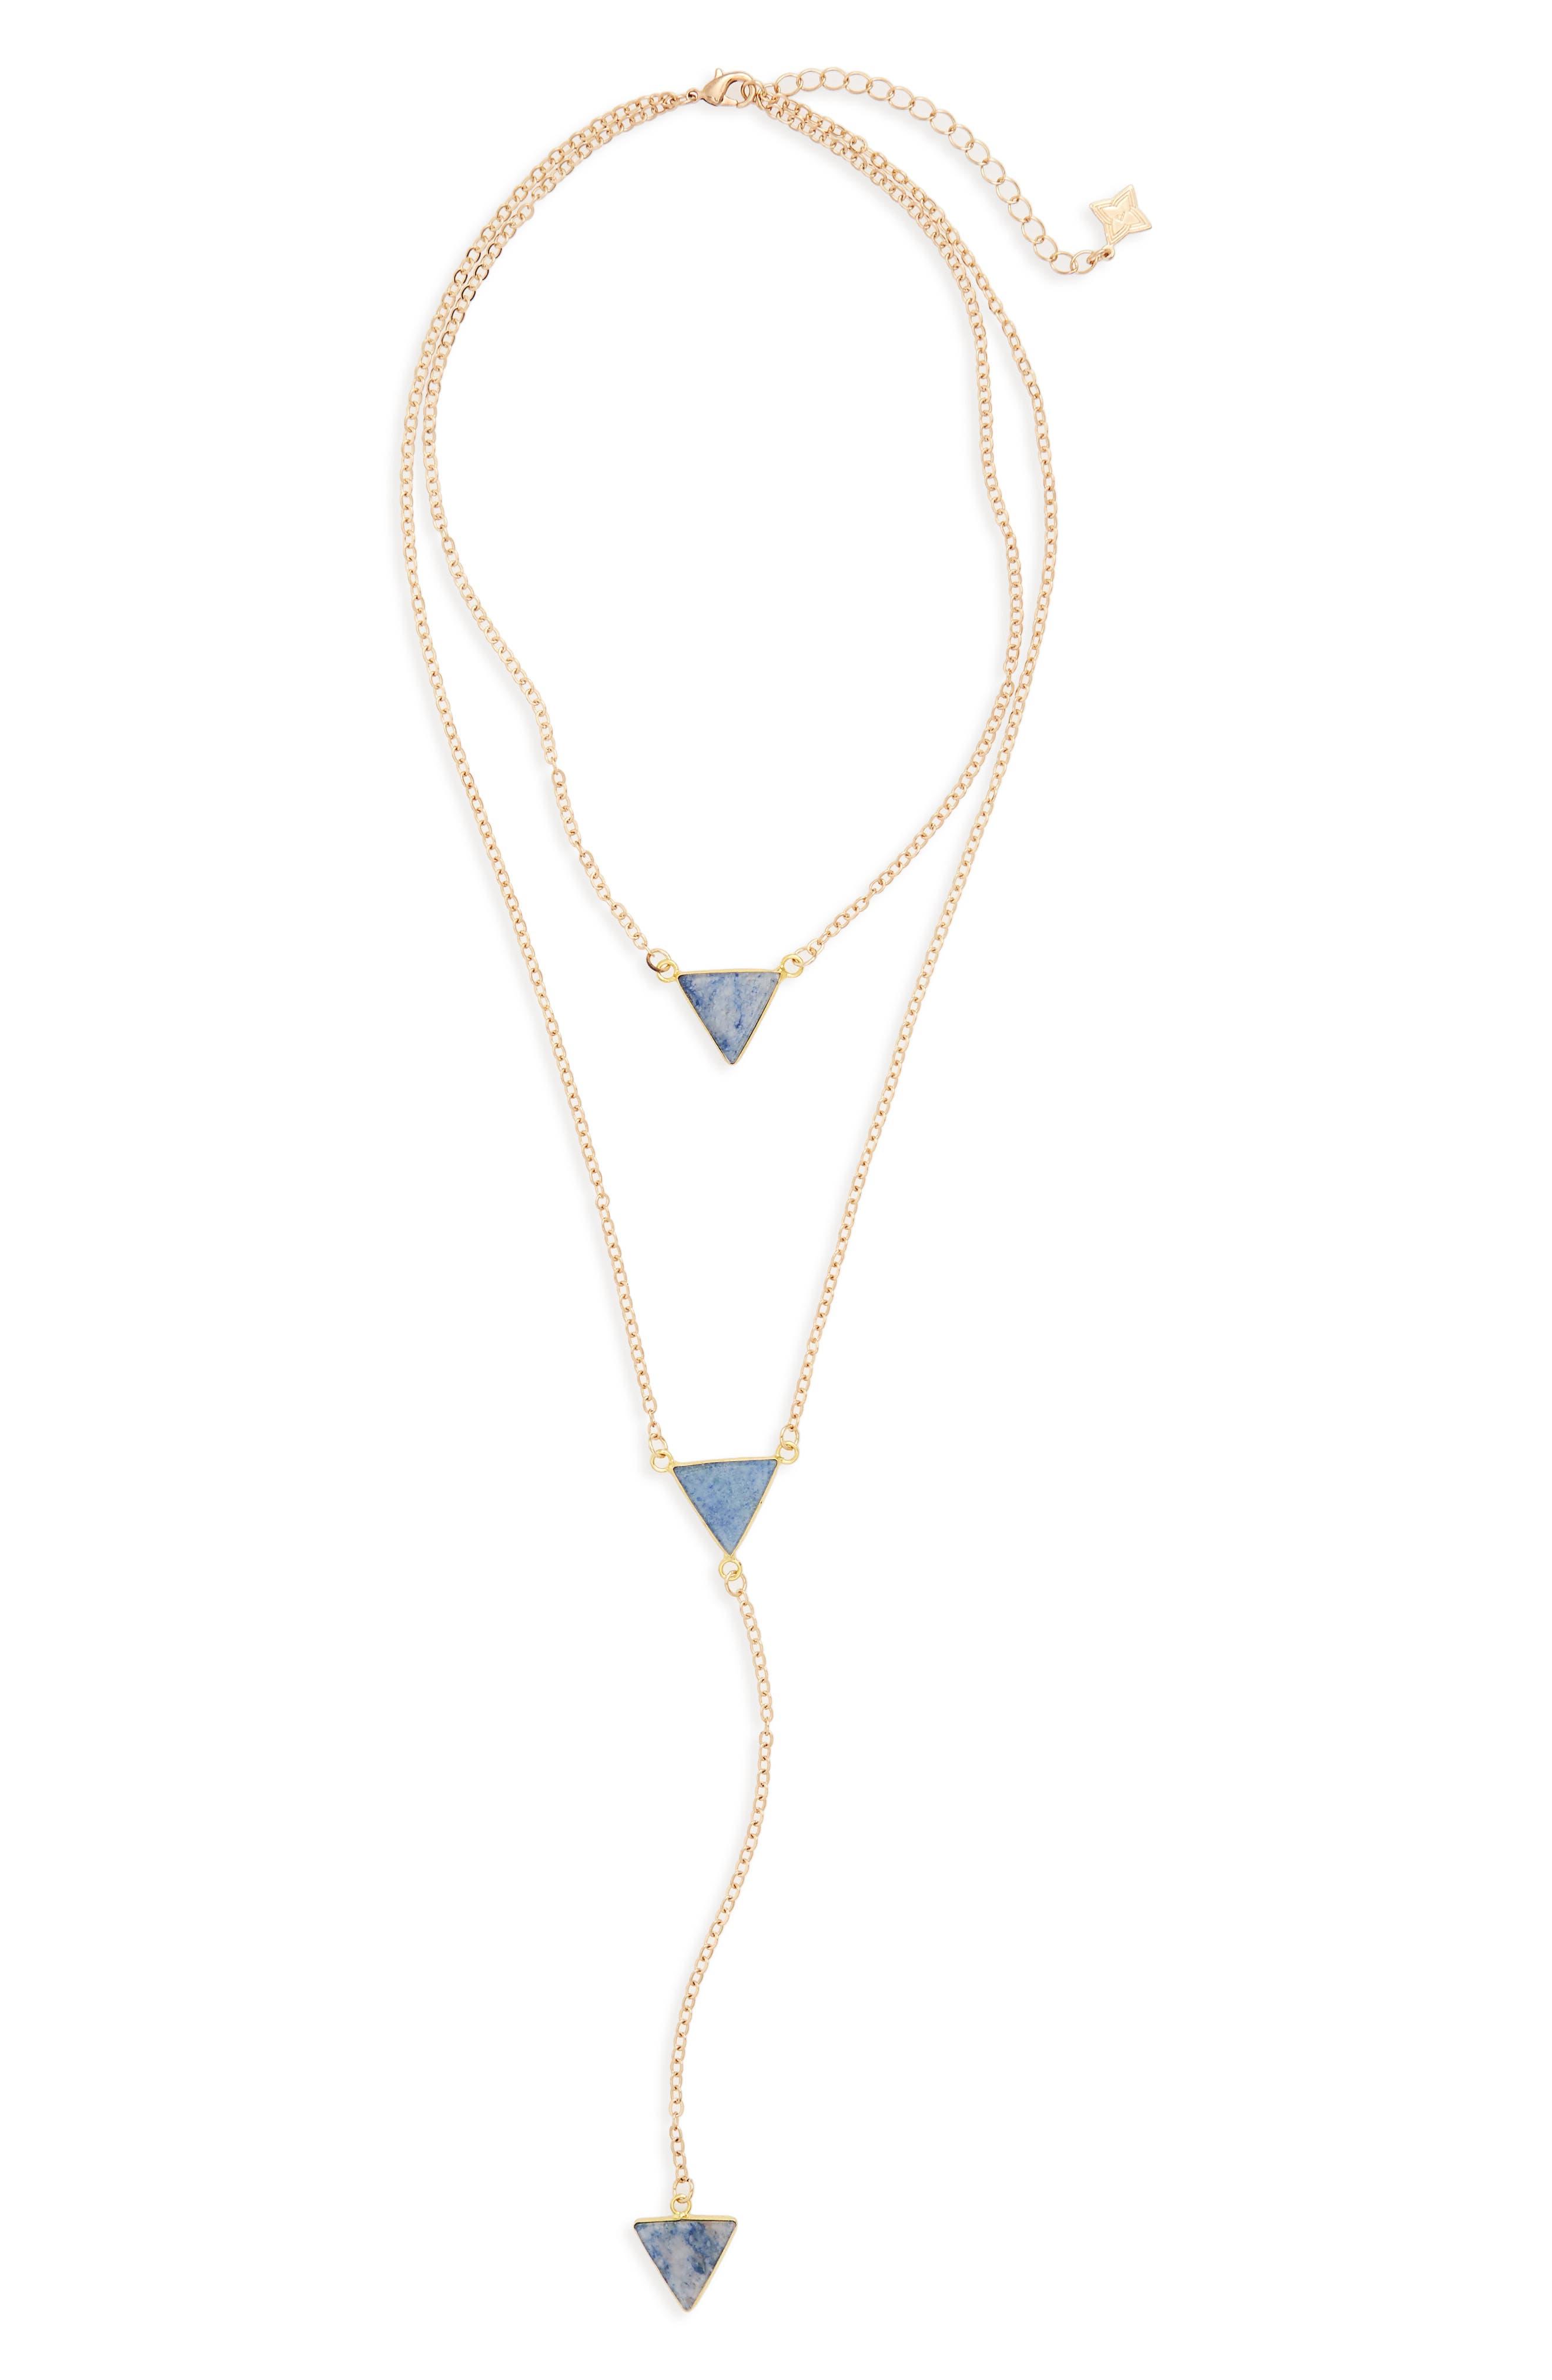 Alternate Image 1 Selected - Panacea Semiprecious Stone Layered Y-Necklace